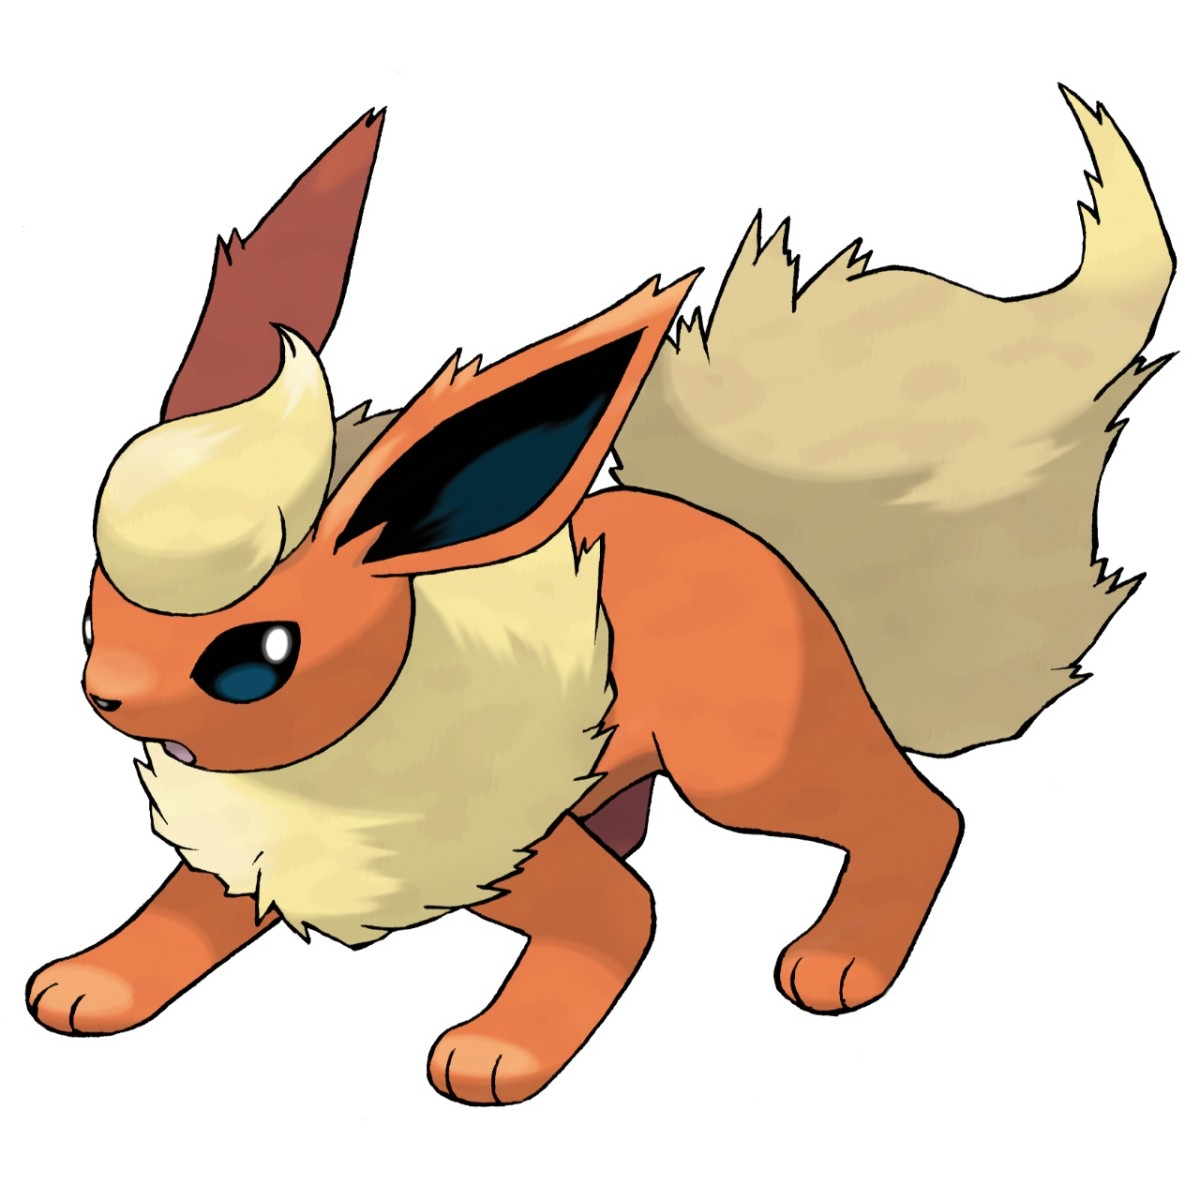 Flareon is Eevee's Fire-type evolutionary form.